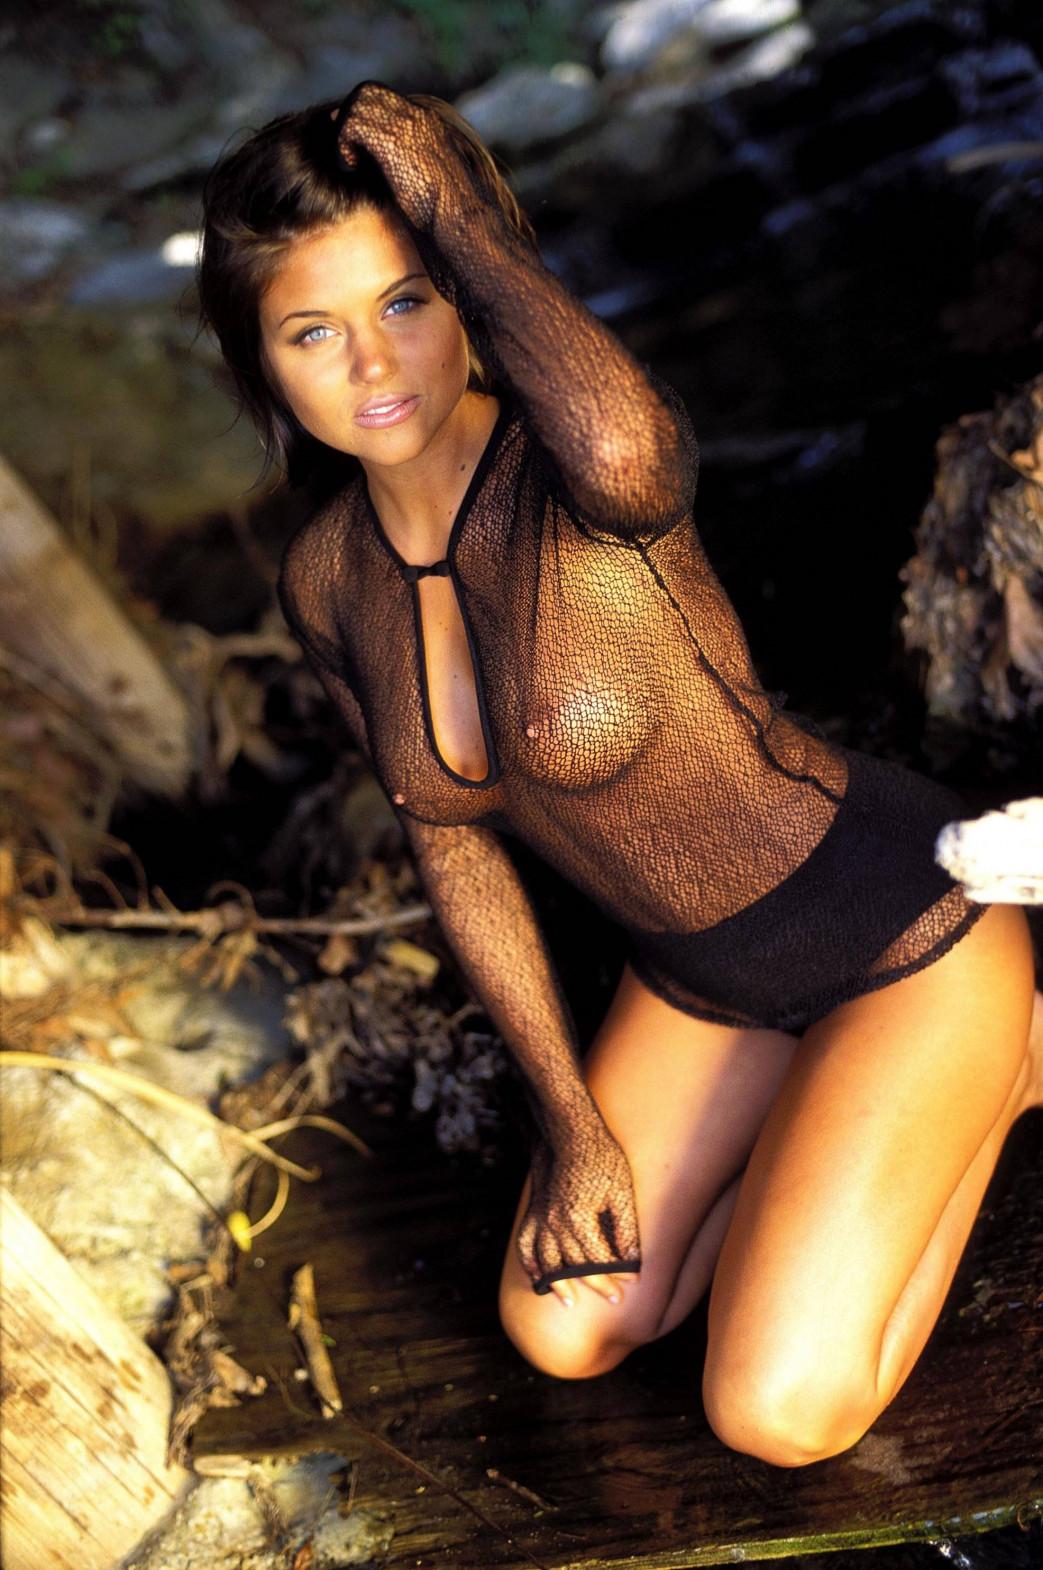 Tiffani-Amber-Thiessen-nude-3.jpg